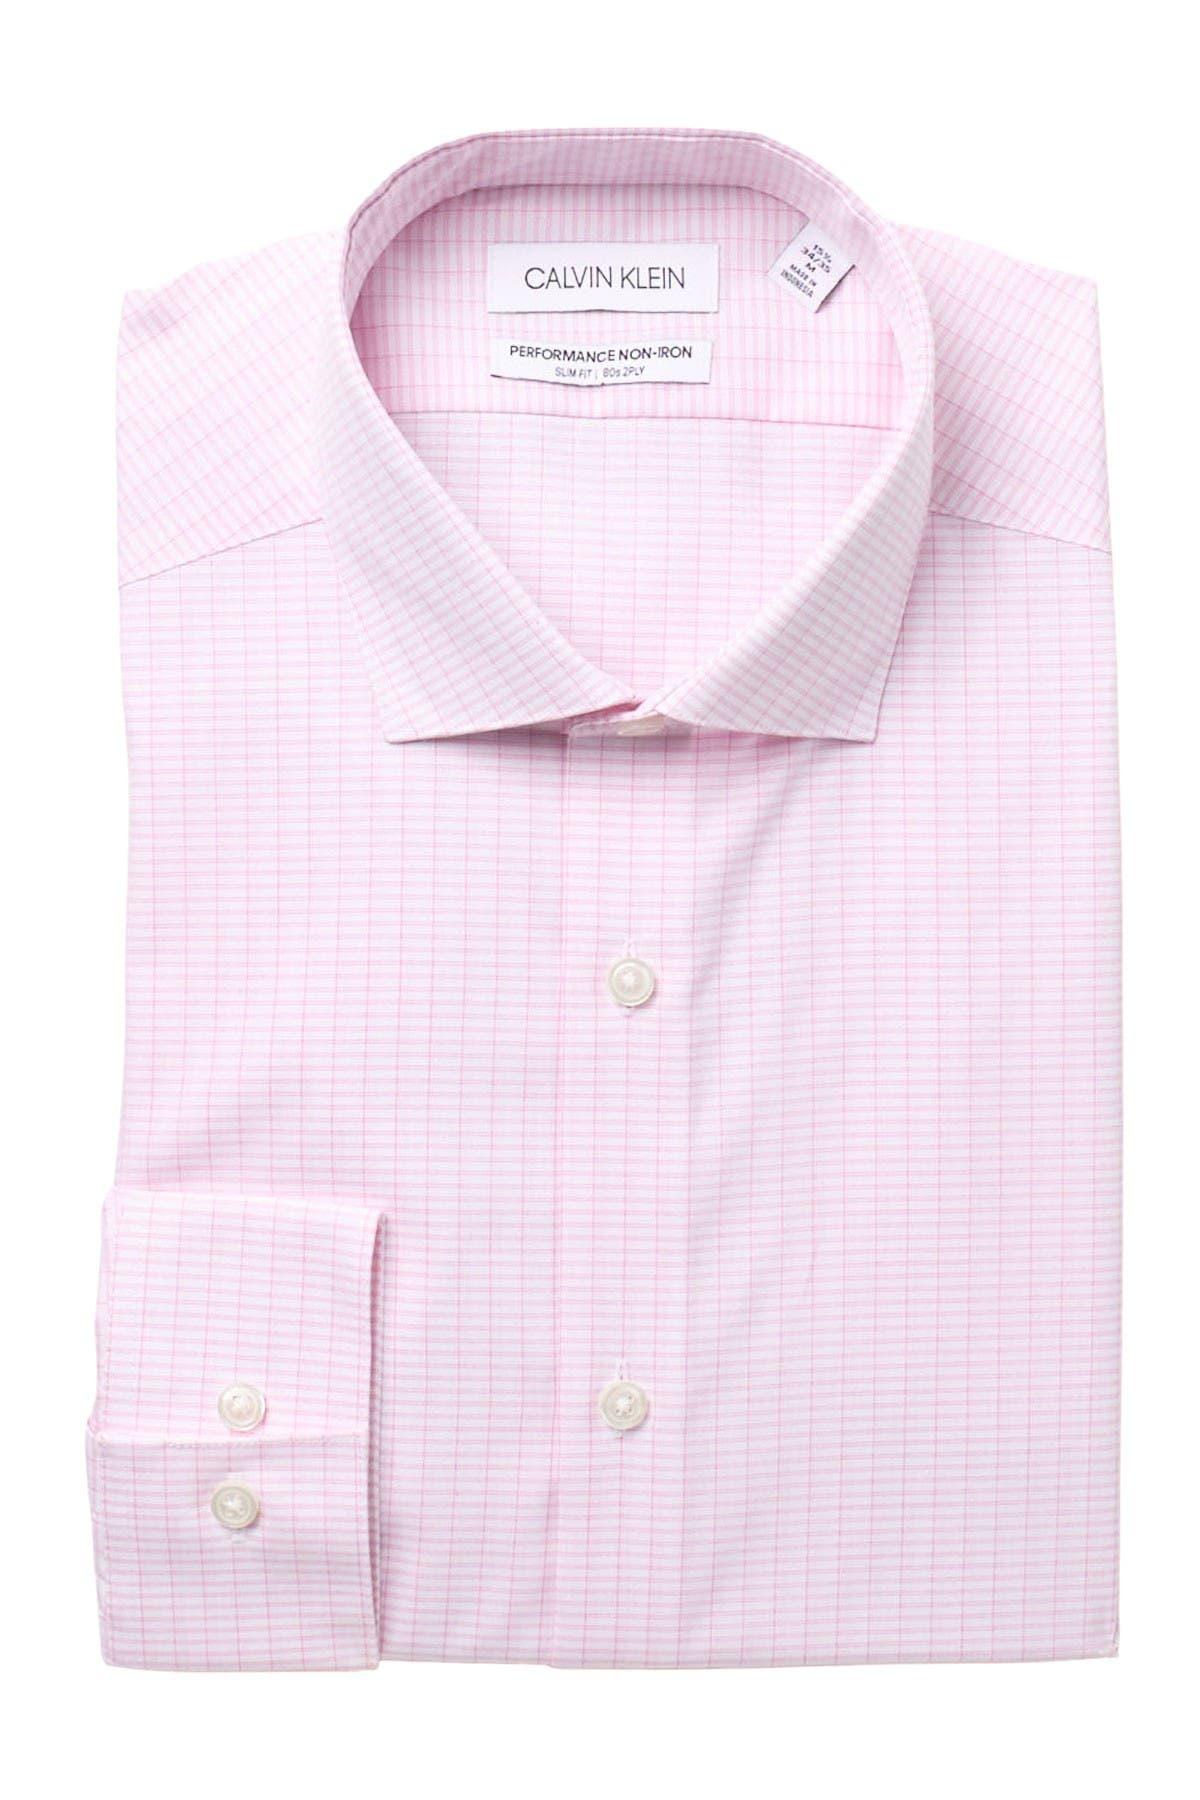 Image of Calvin Klein Slim Fit Non-Iron Slim Fit Dress Shirt